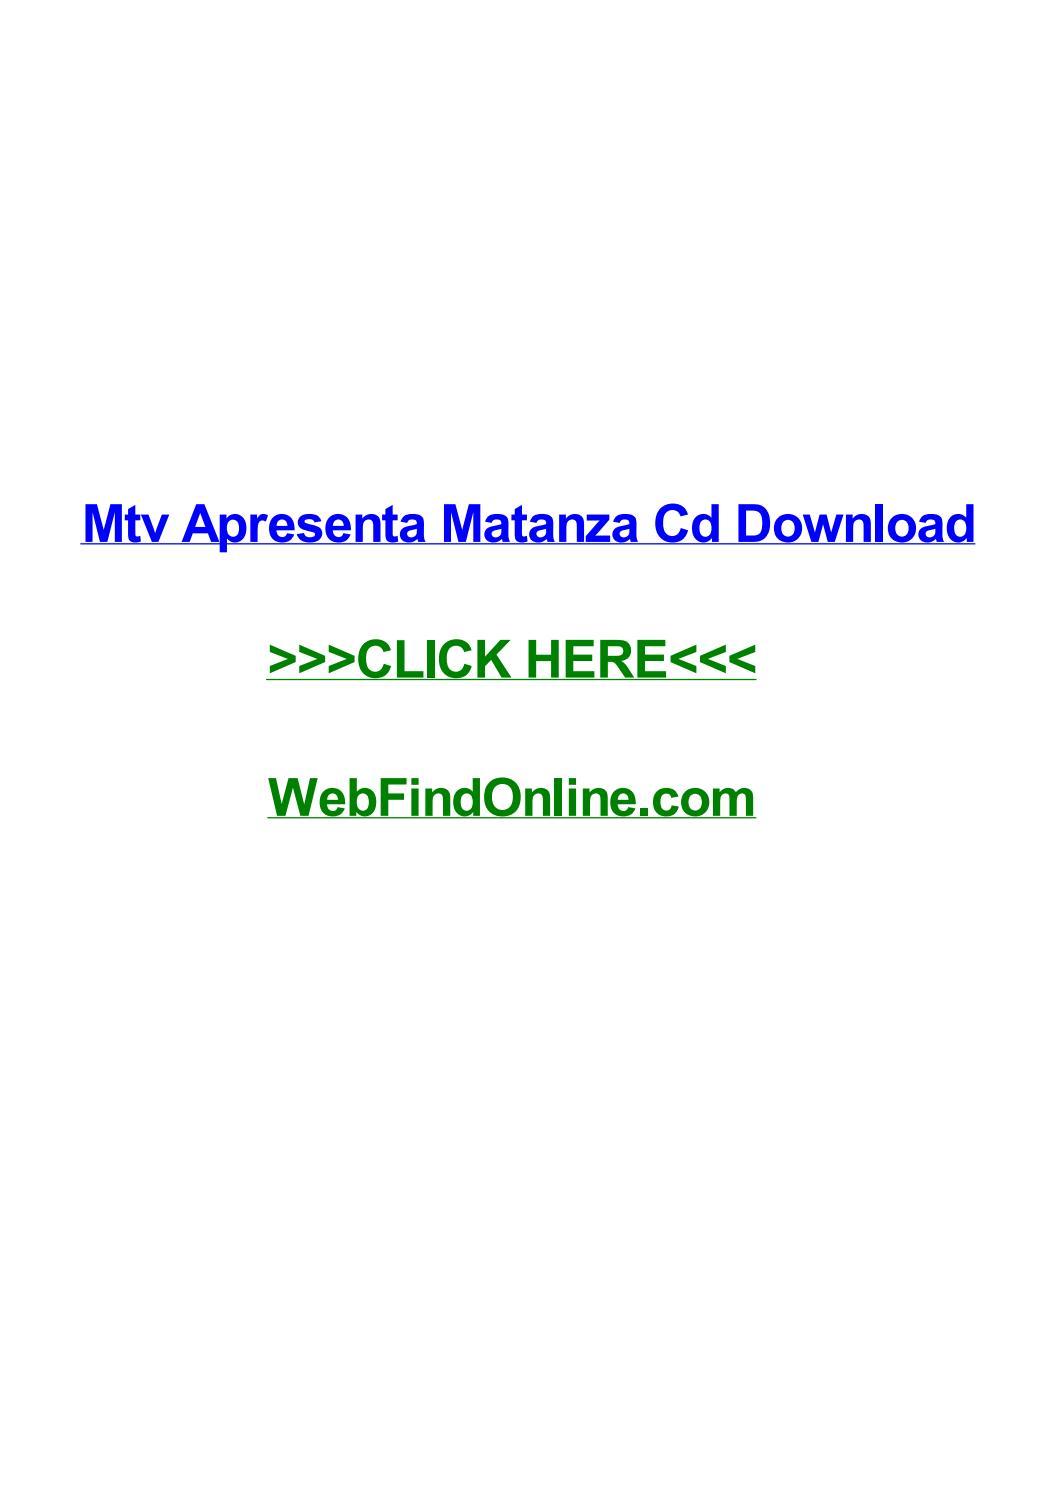 APRESENTA MATANZA MTV BAIXAR SHOW